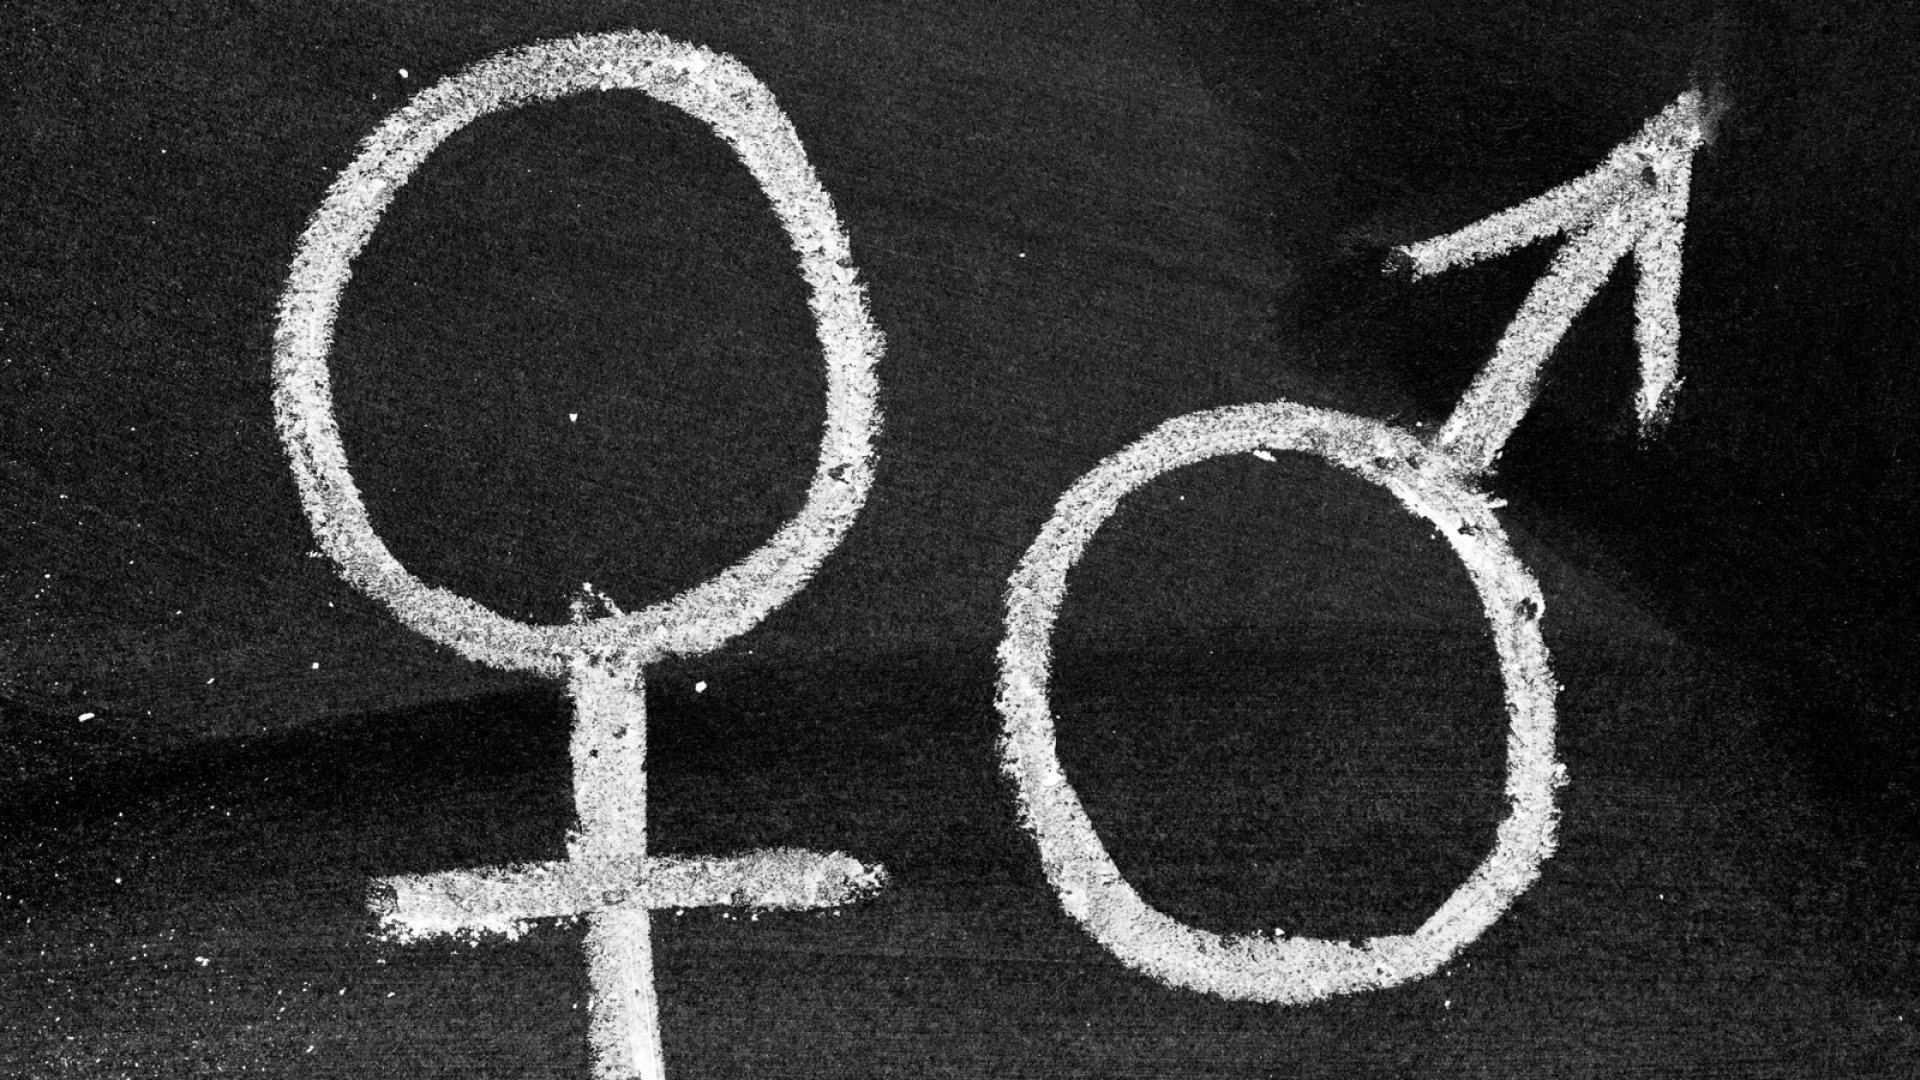 One Surprising Reason for Women's Salary Gap in Tech